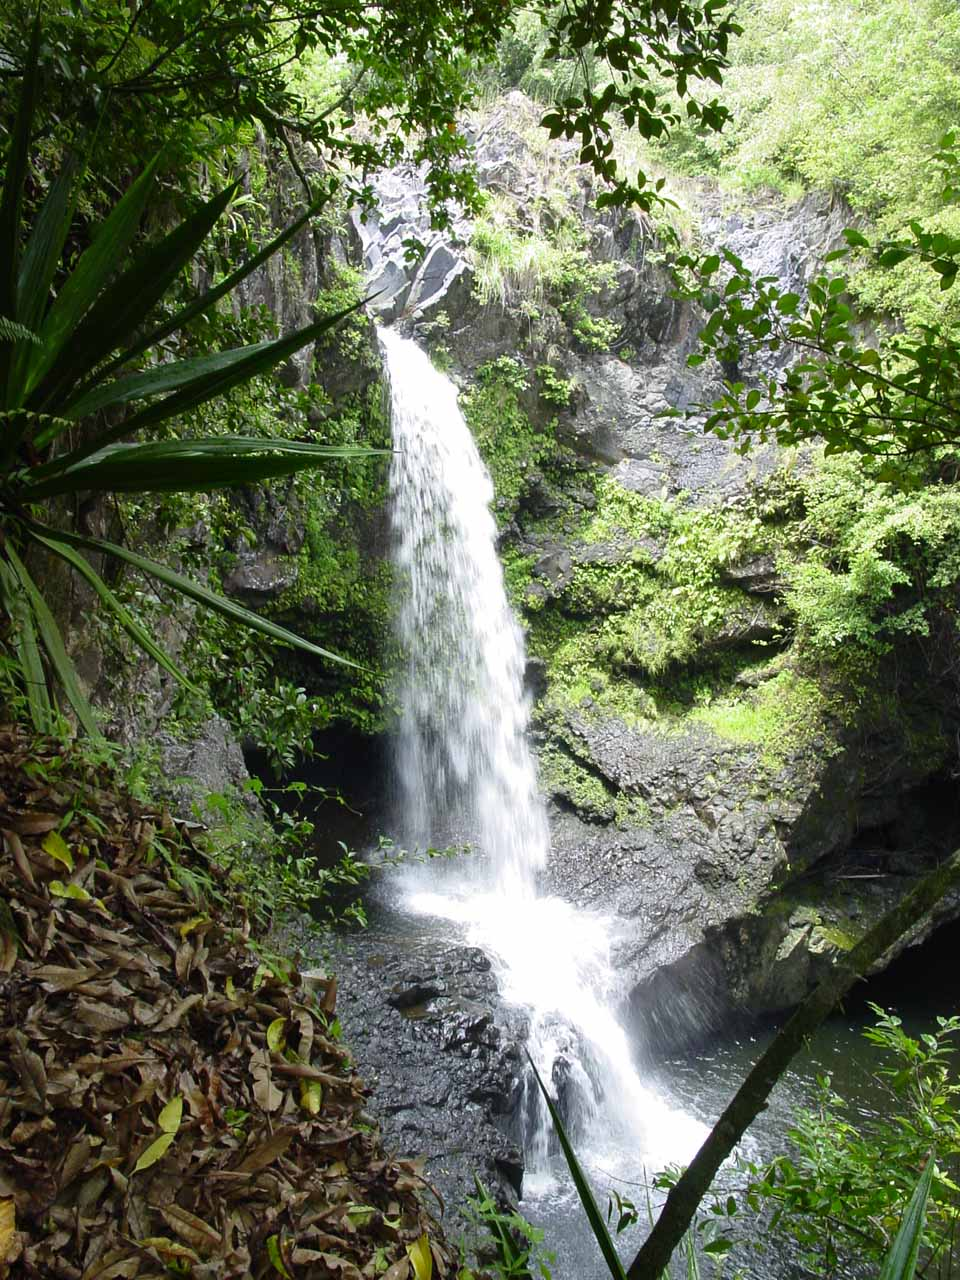 Interesting waterfall not far from Makahiku Falls